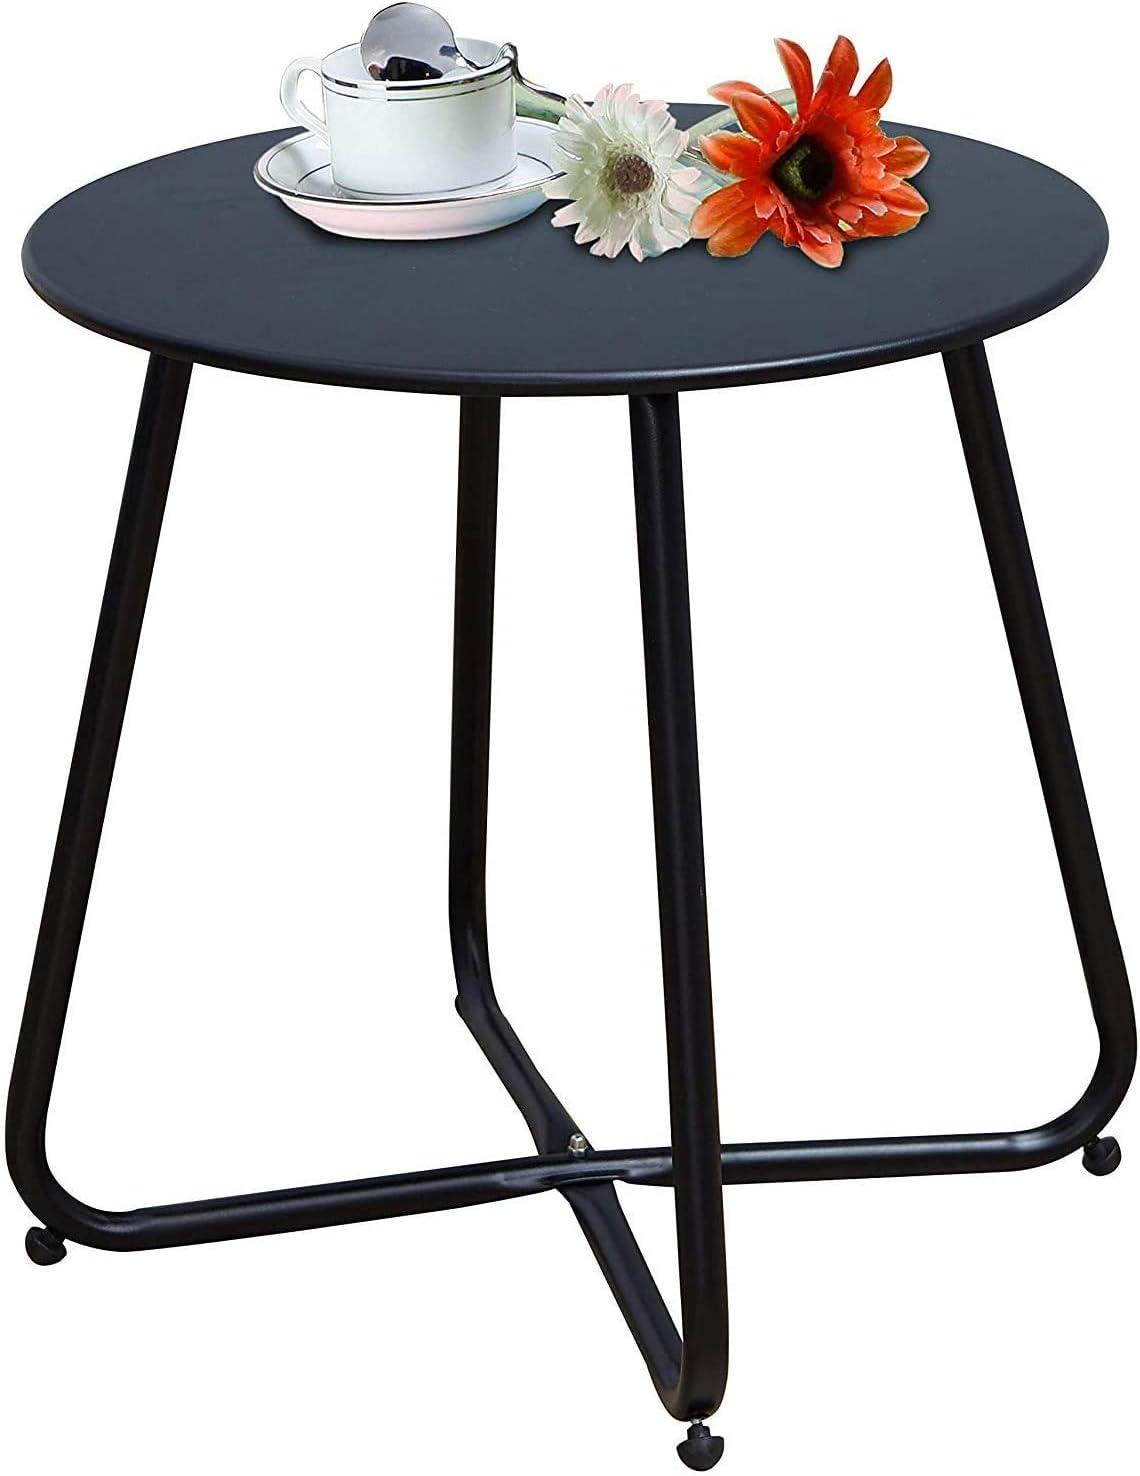 INOVIX Grand Premium Indoor Outdoor Round Metal Weather-Resistant Side Accent Table for Patio, Yard, Balcony, Garden, Pink